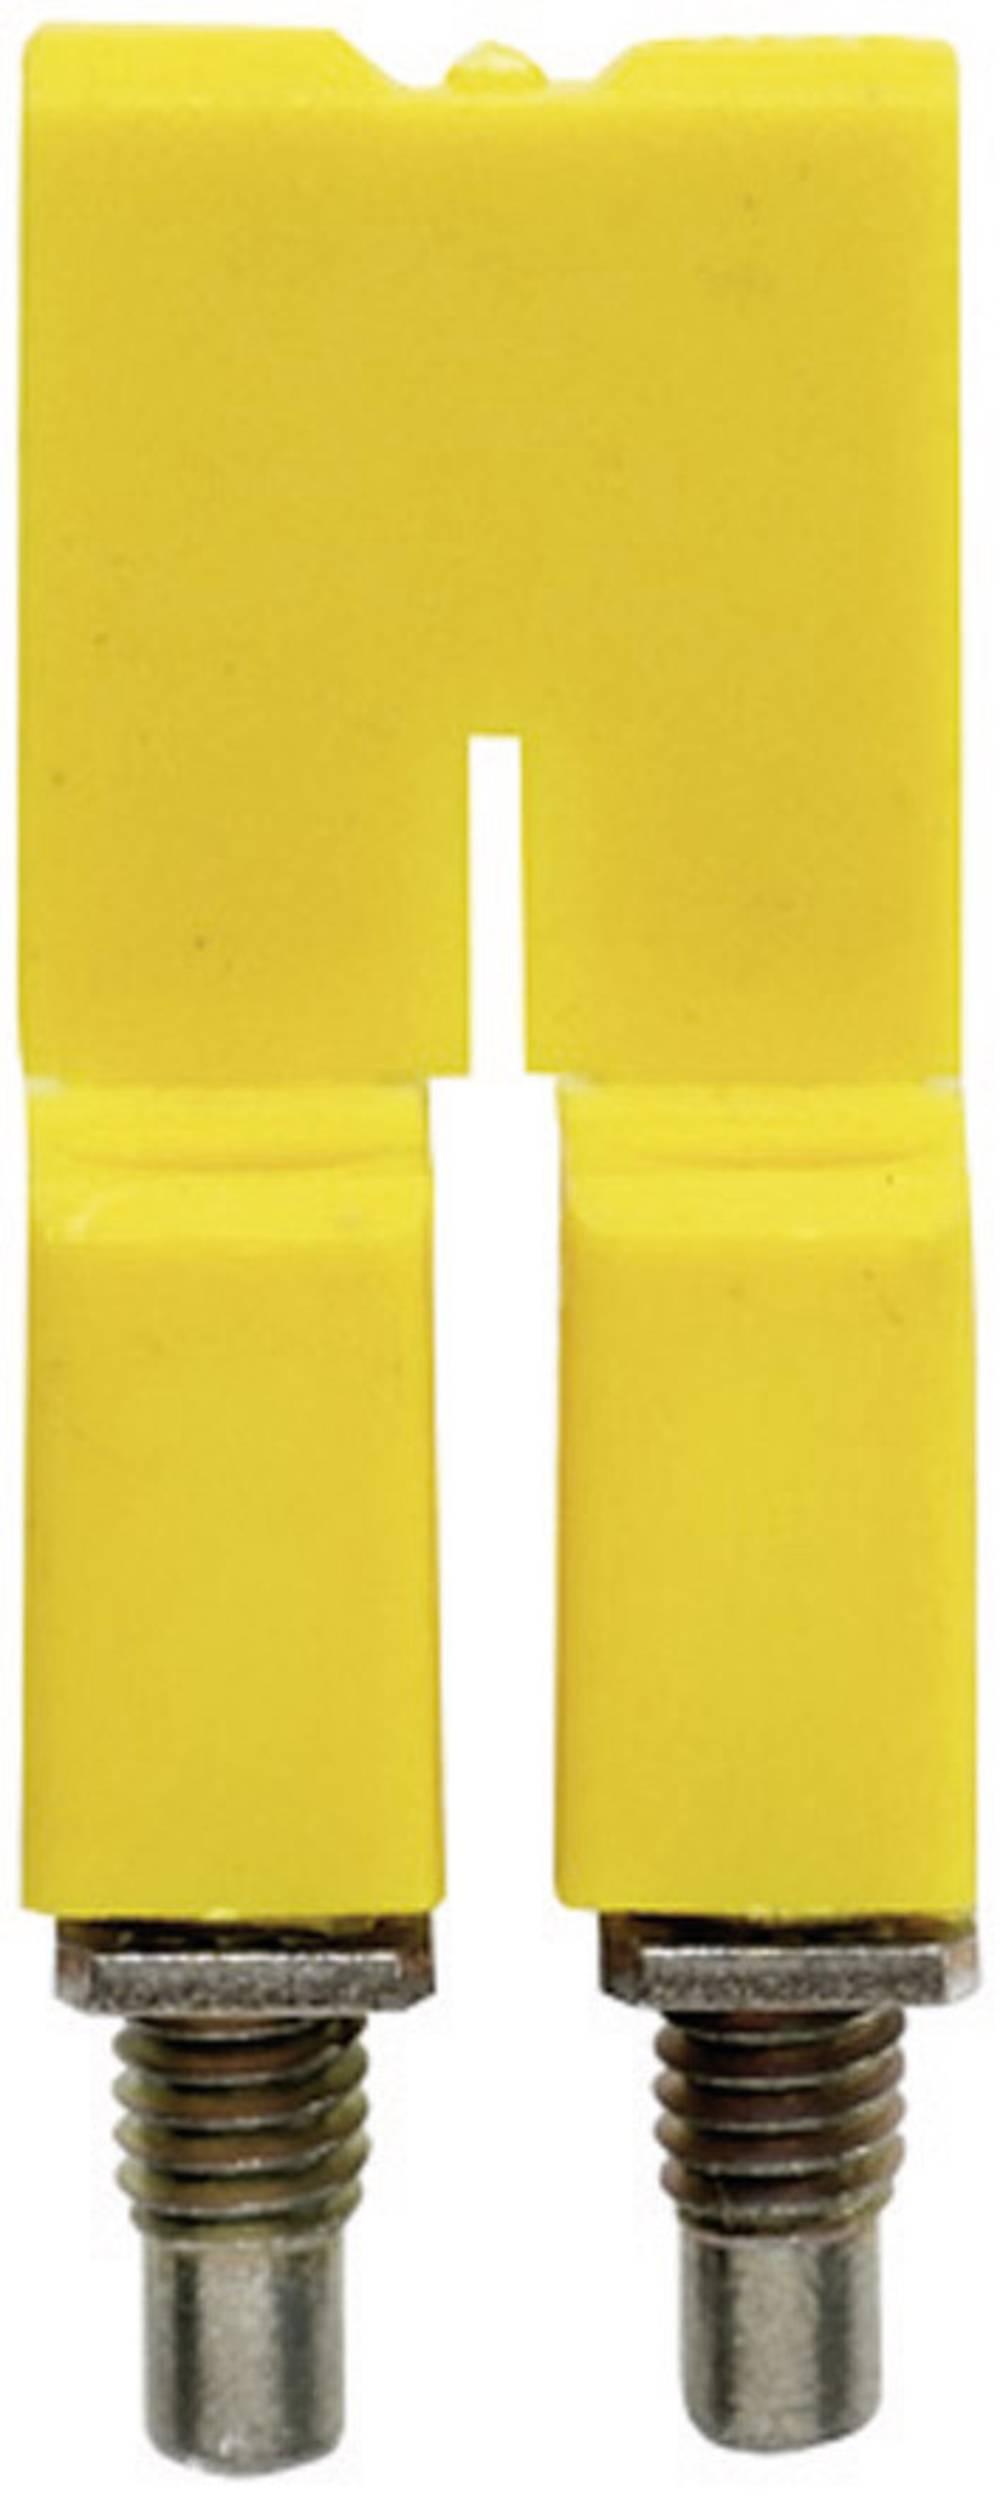 Rækkeklemmetilbehør Weidmüller WQV 10/3 1054960000 Gul Weidmüller 1 stk